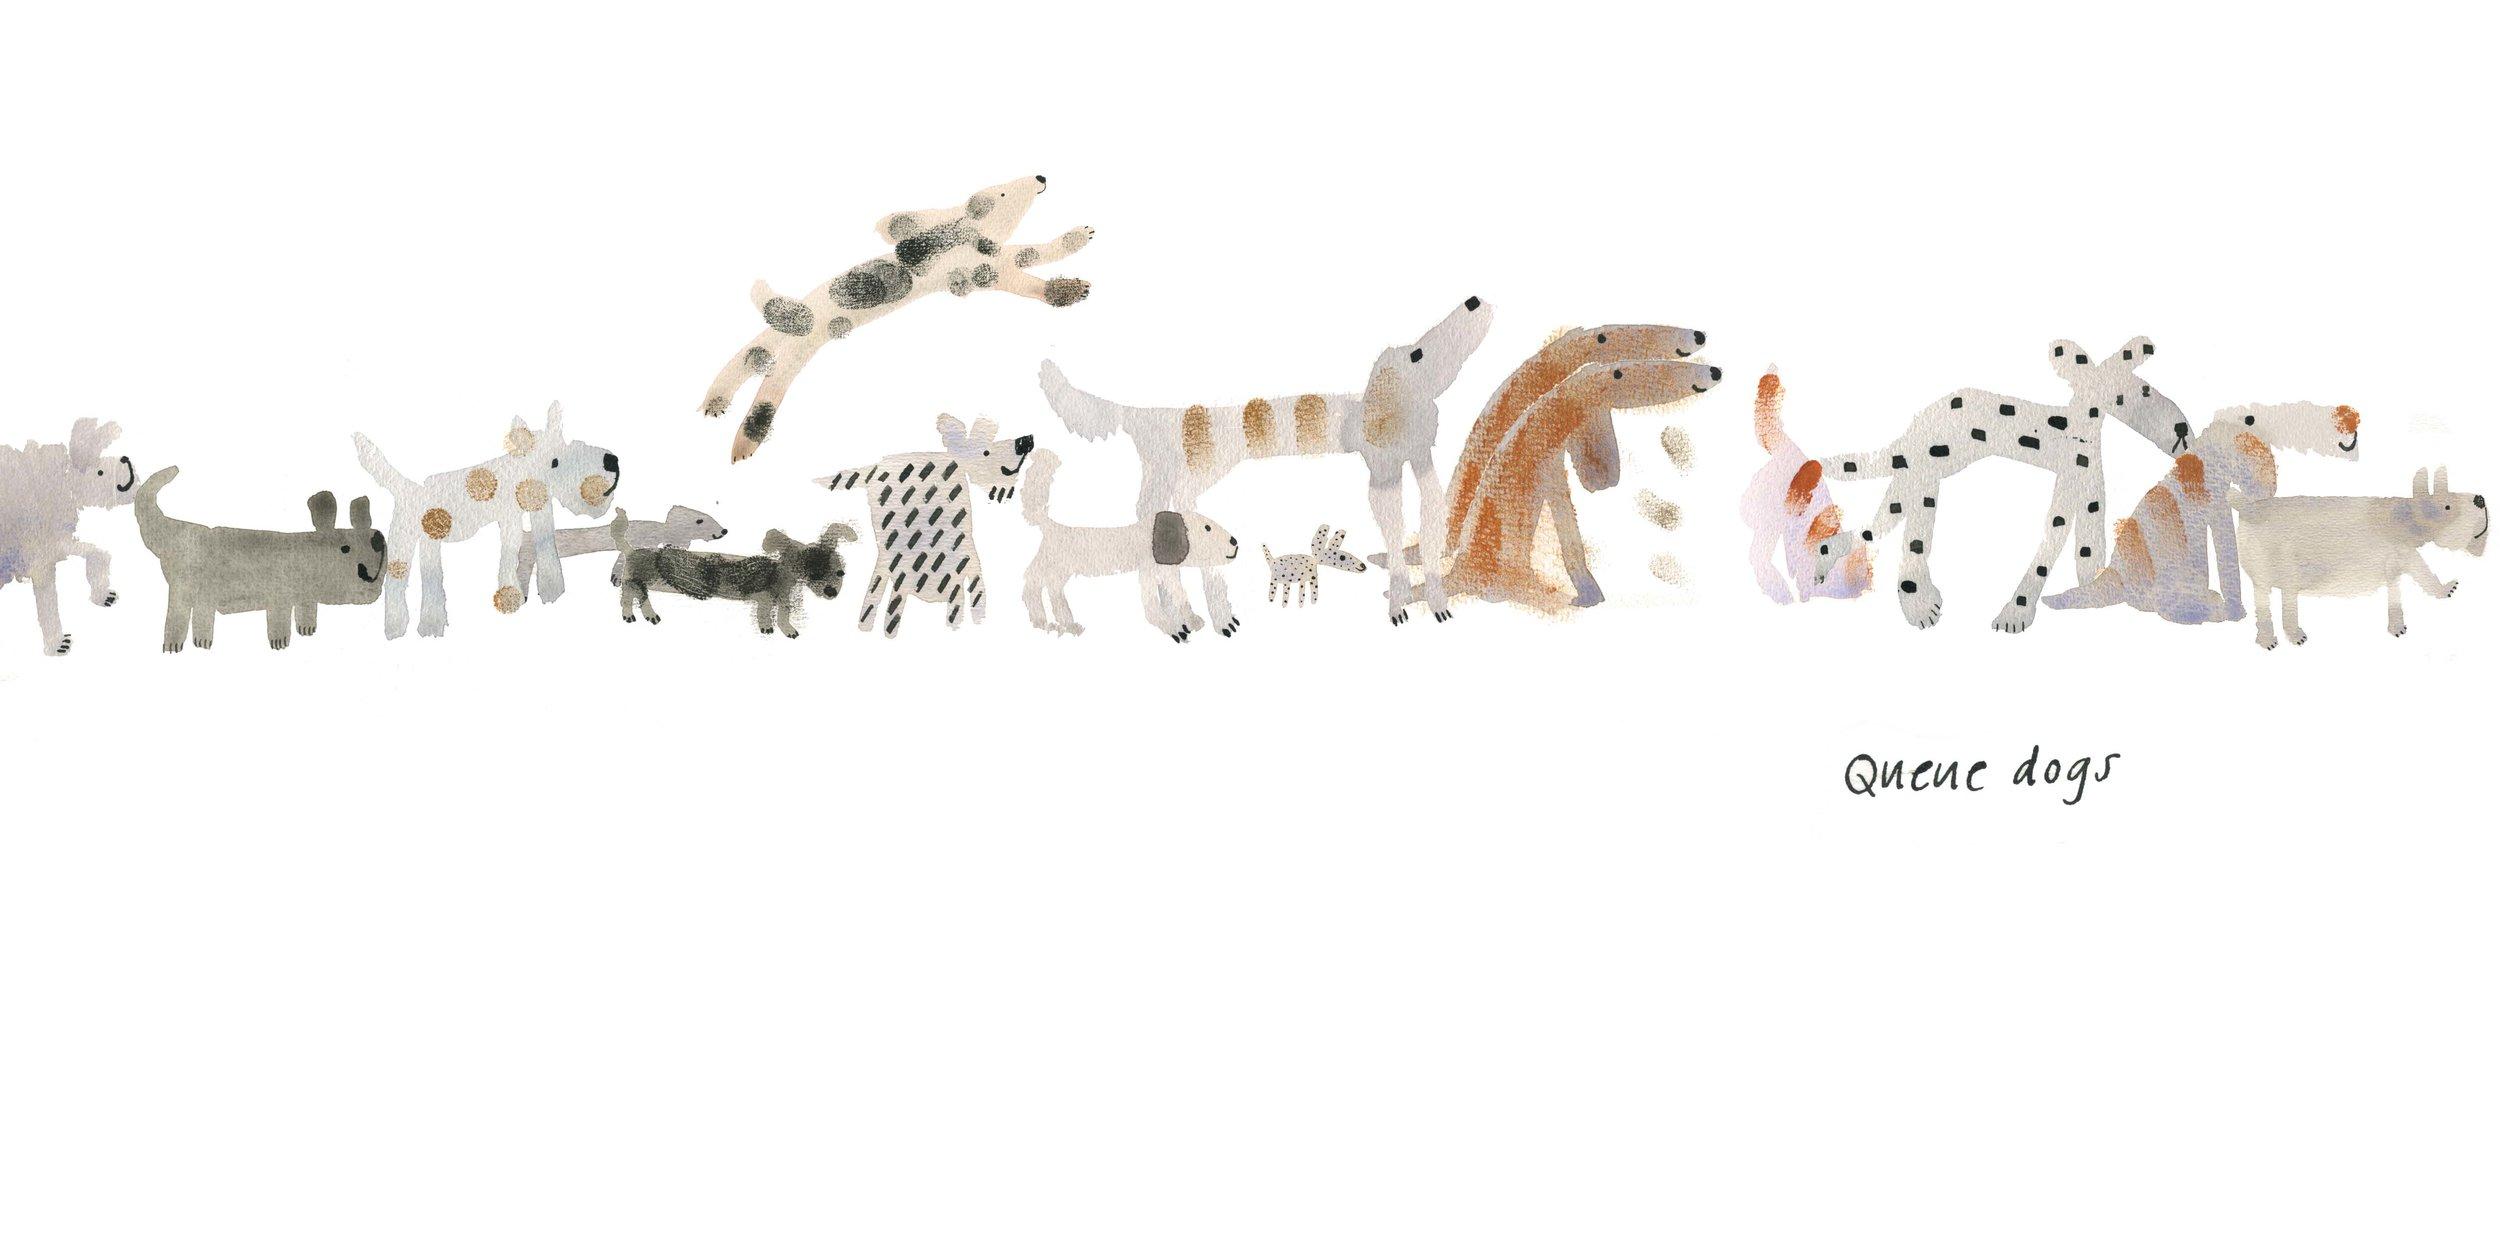 012 dogs spread 9.jpg